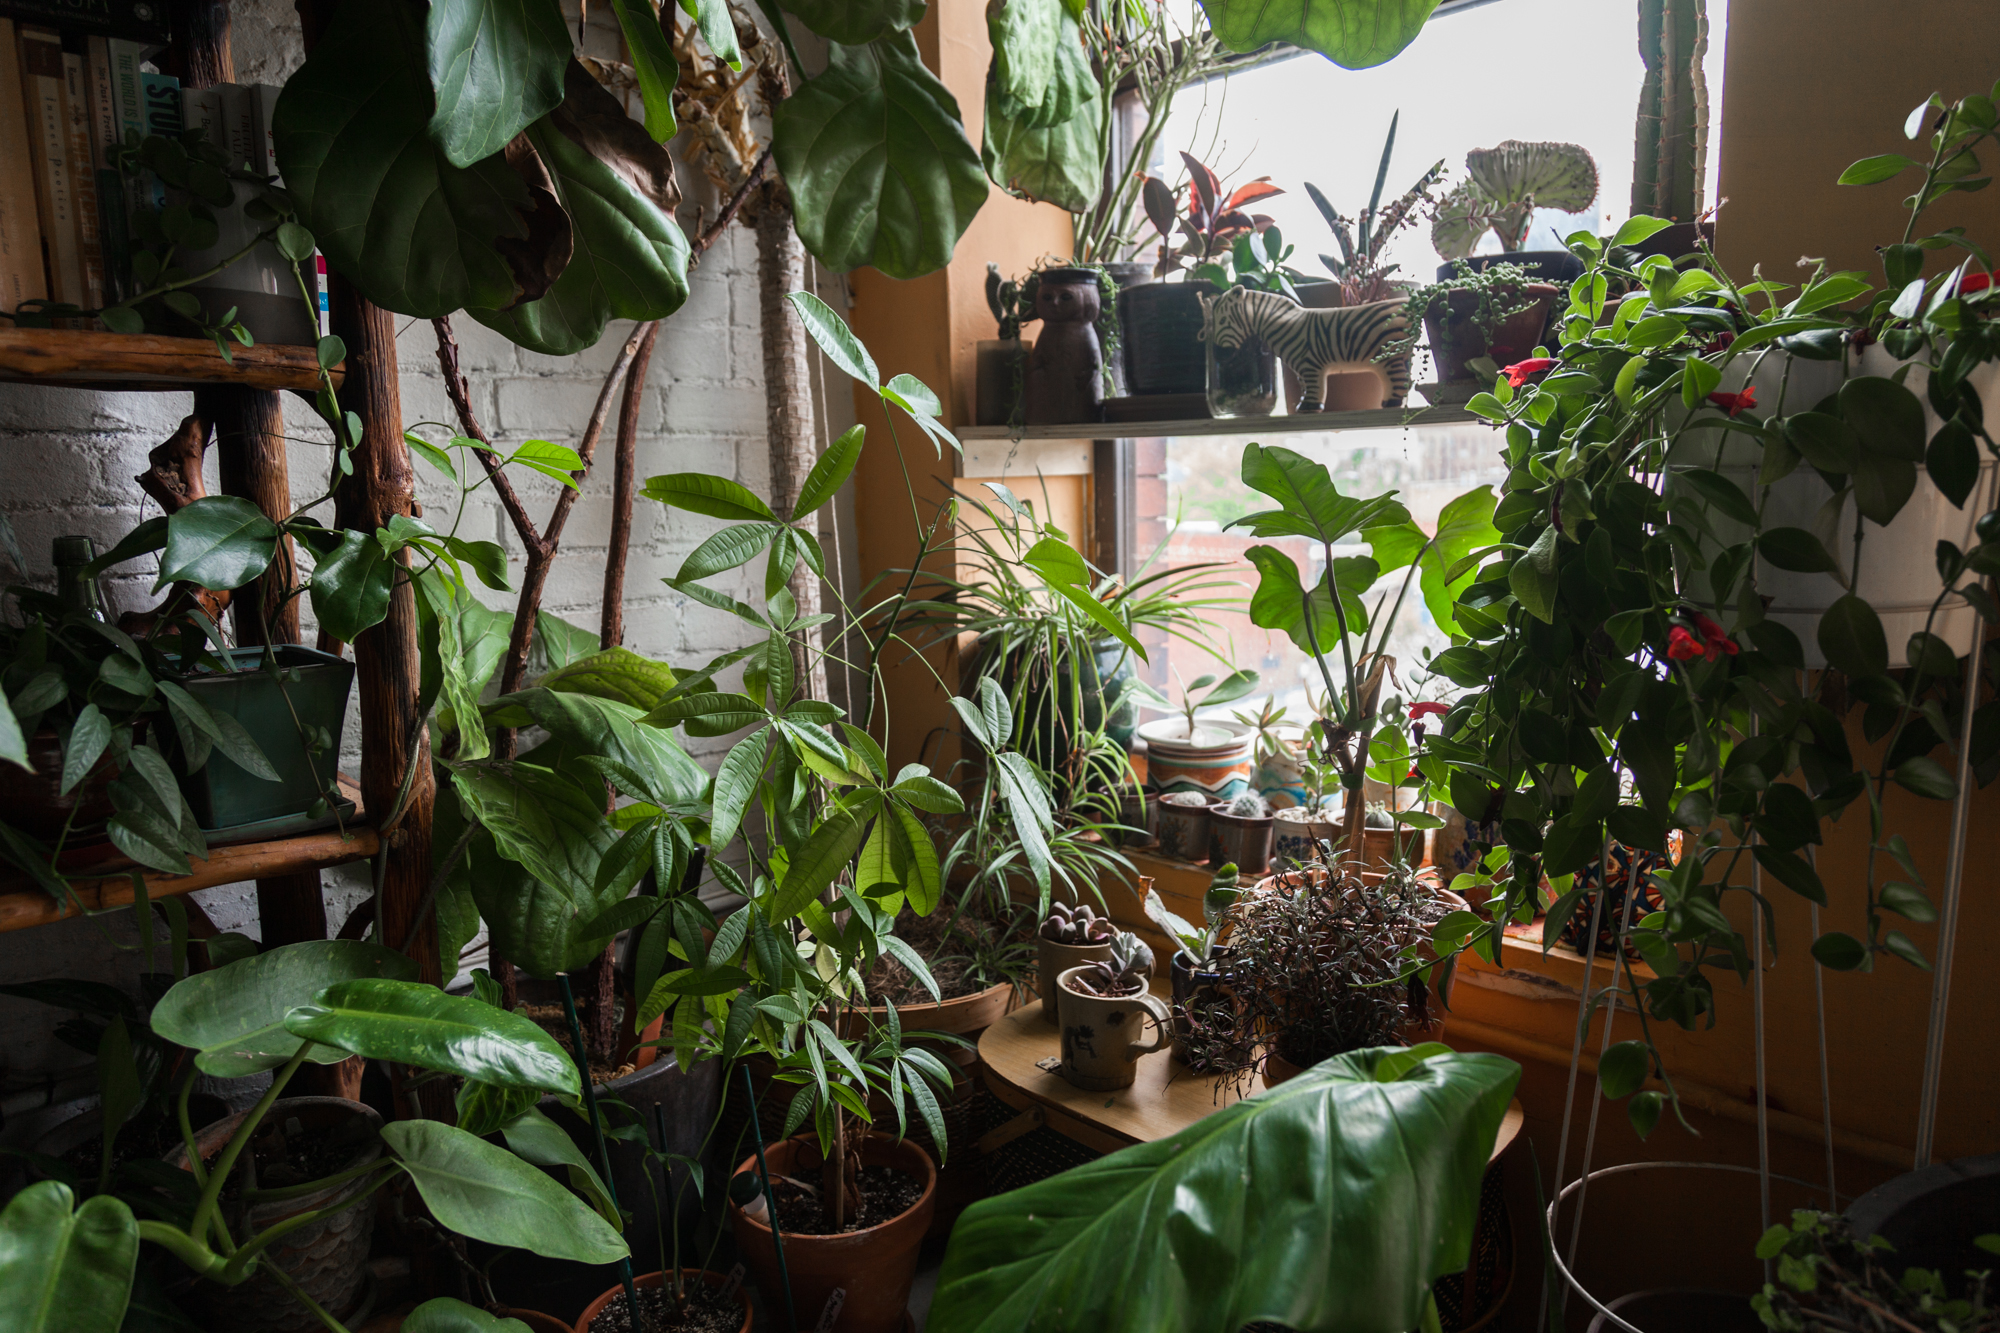 2017-May-6-Plants-SELECTS-9139.jpg